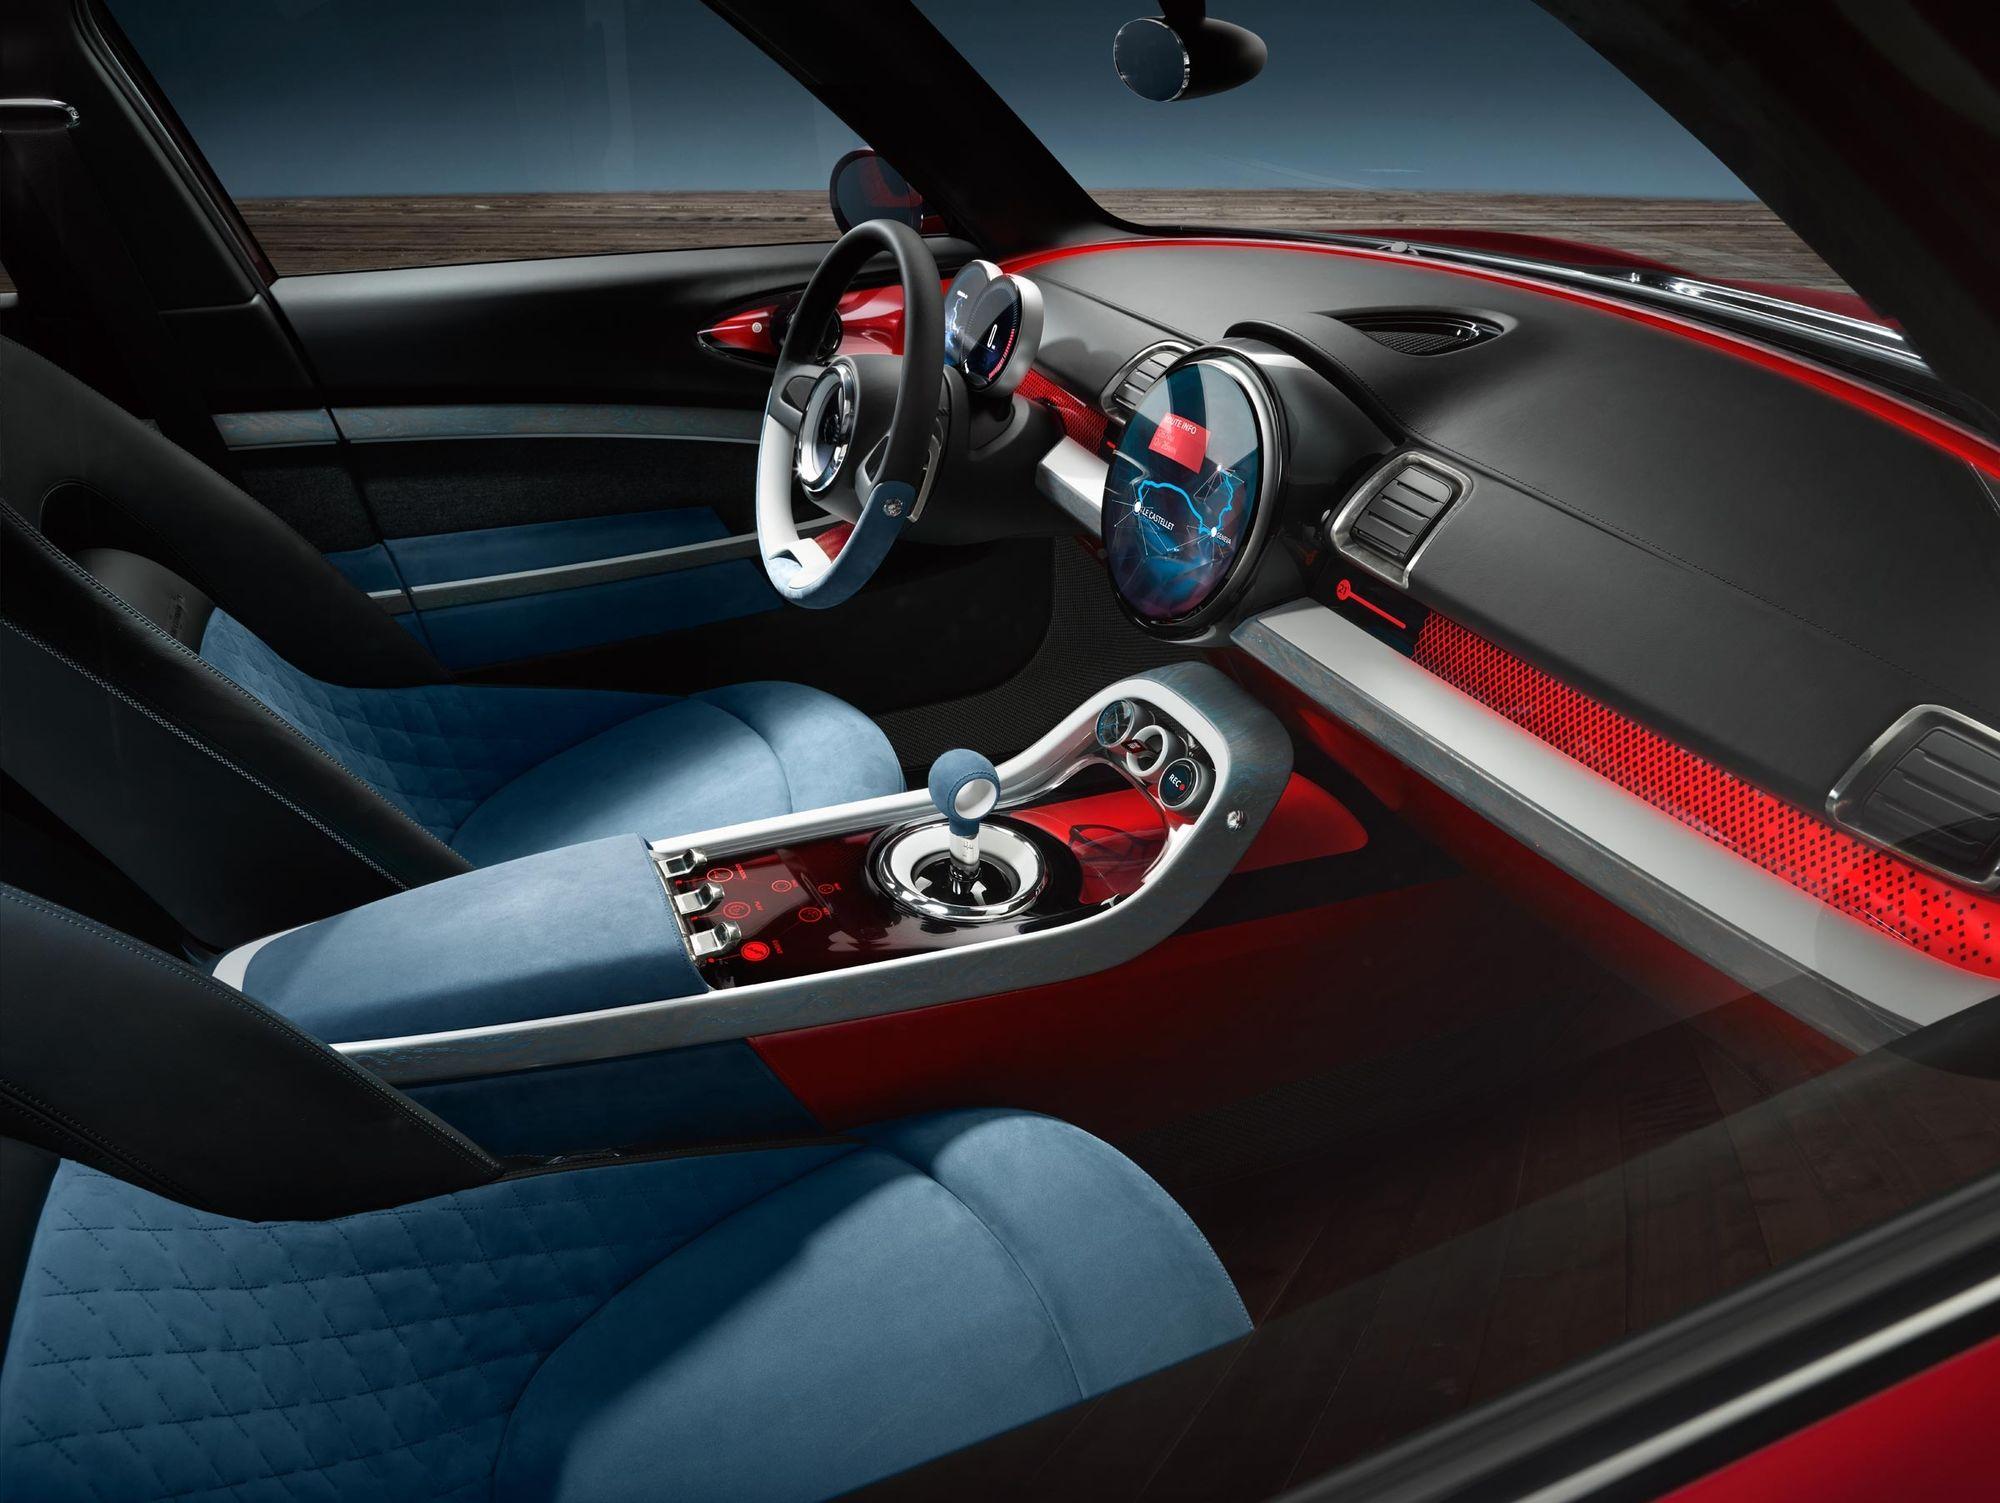 VICTOR JON GOICO FOR BMW - MINI CLUBMAN CONCEPT